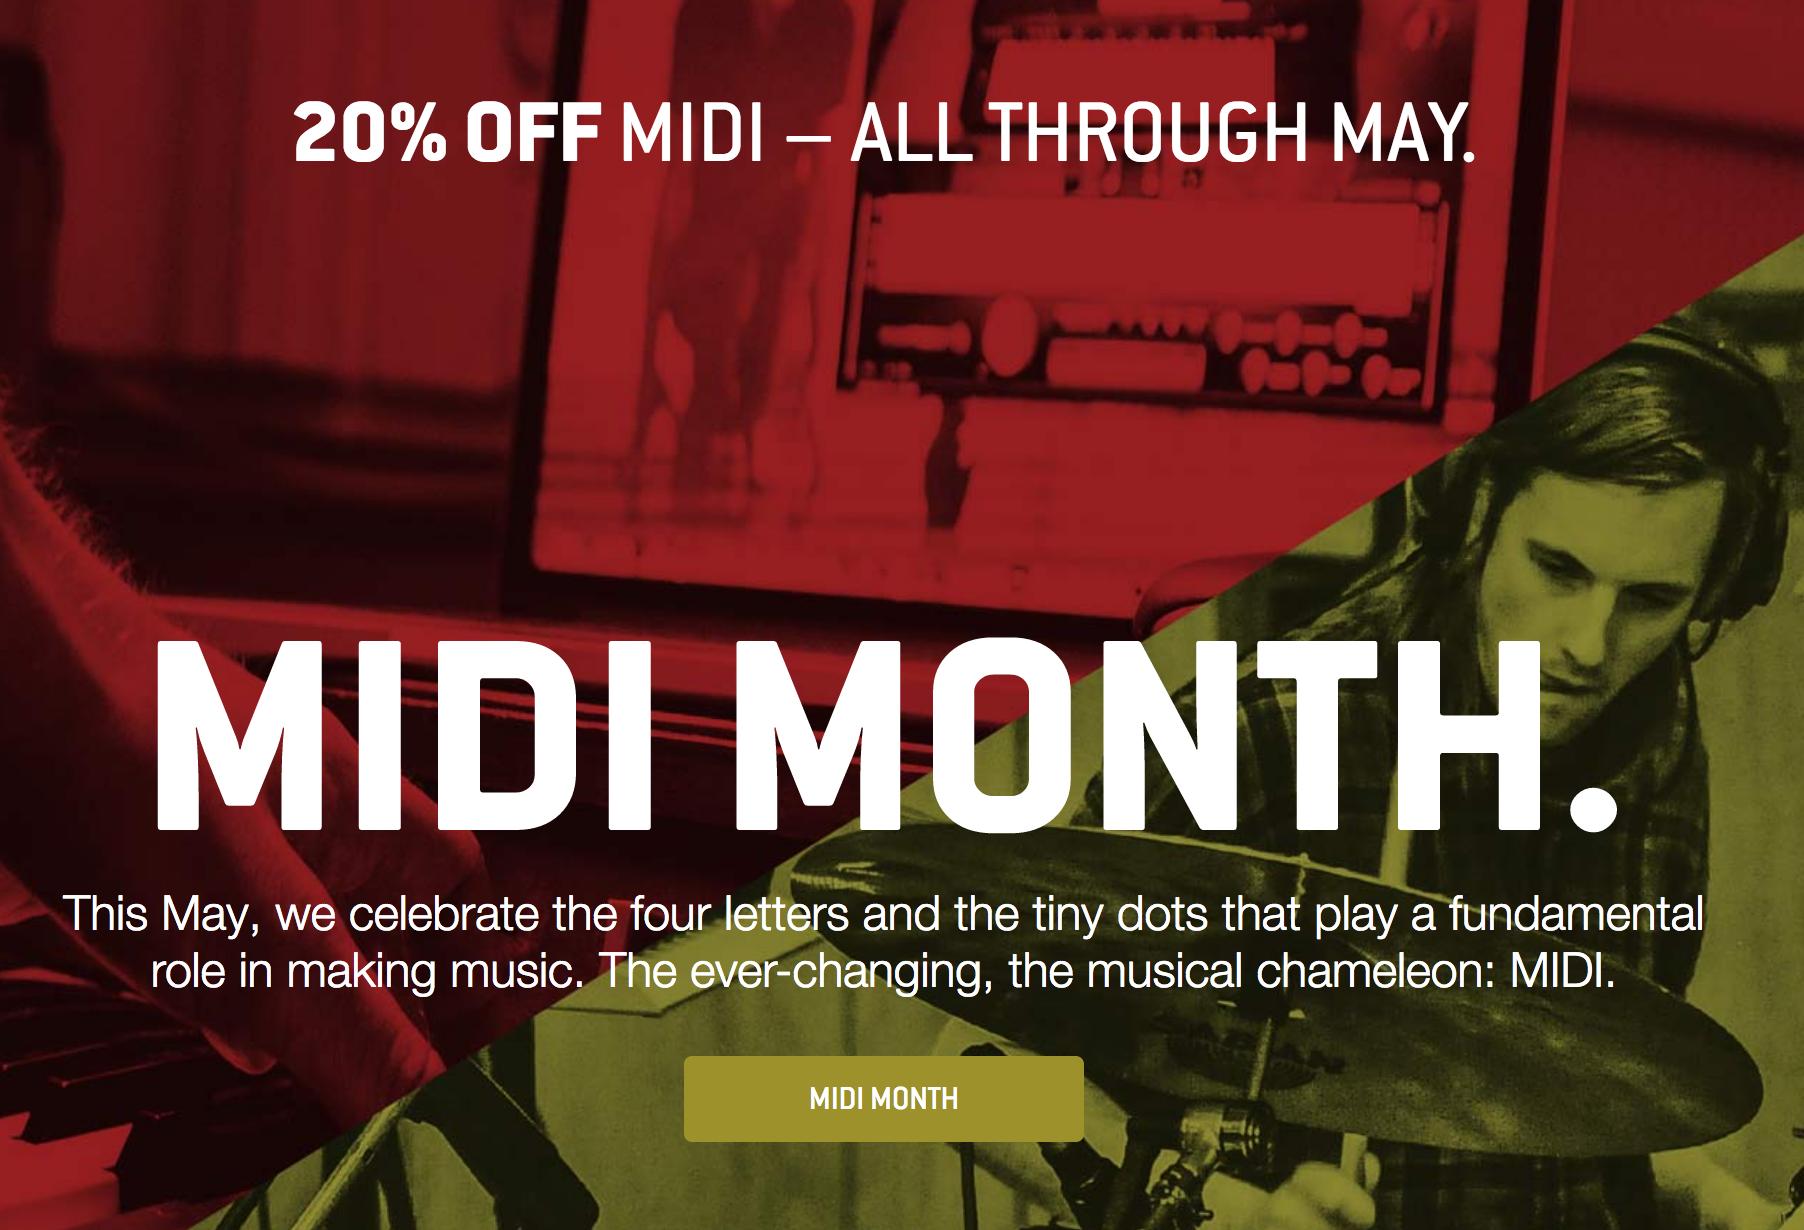 MIDI Month